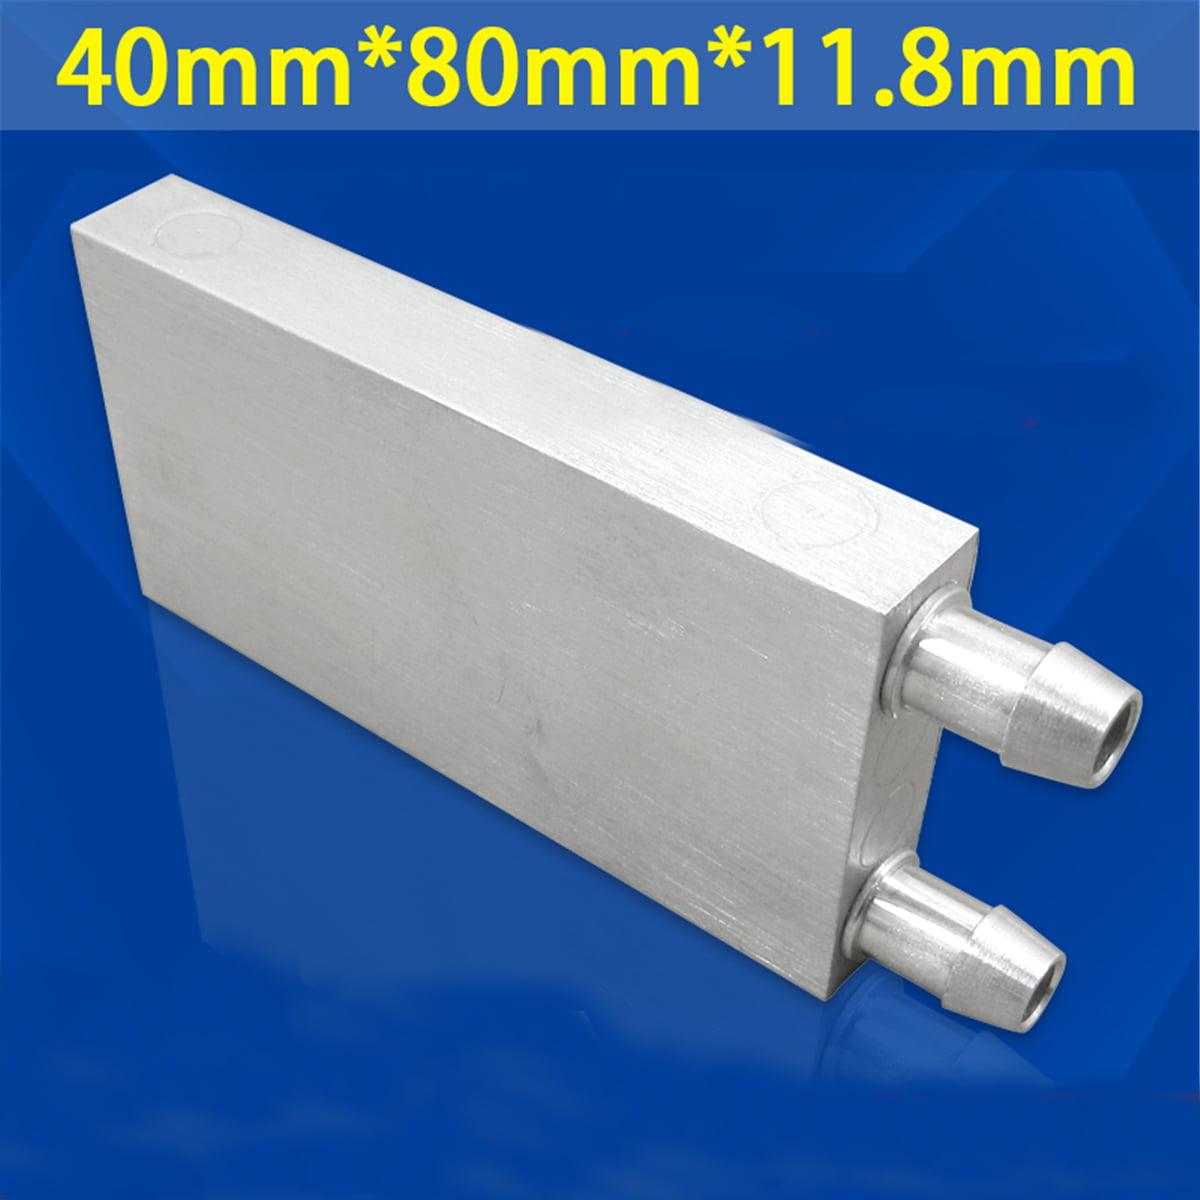 1Pcs Aluminum Water Cooling Block High Temperature Resistant Water Cooling Head